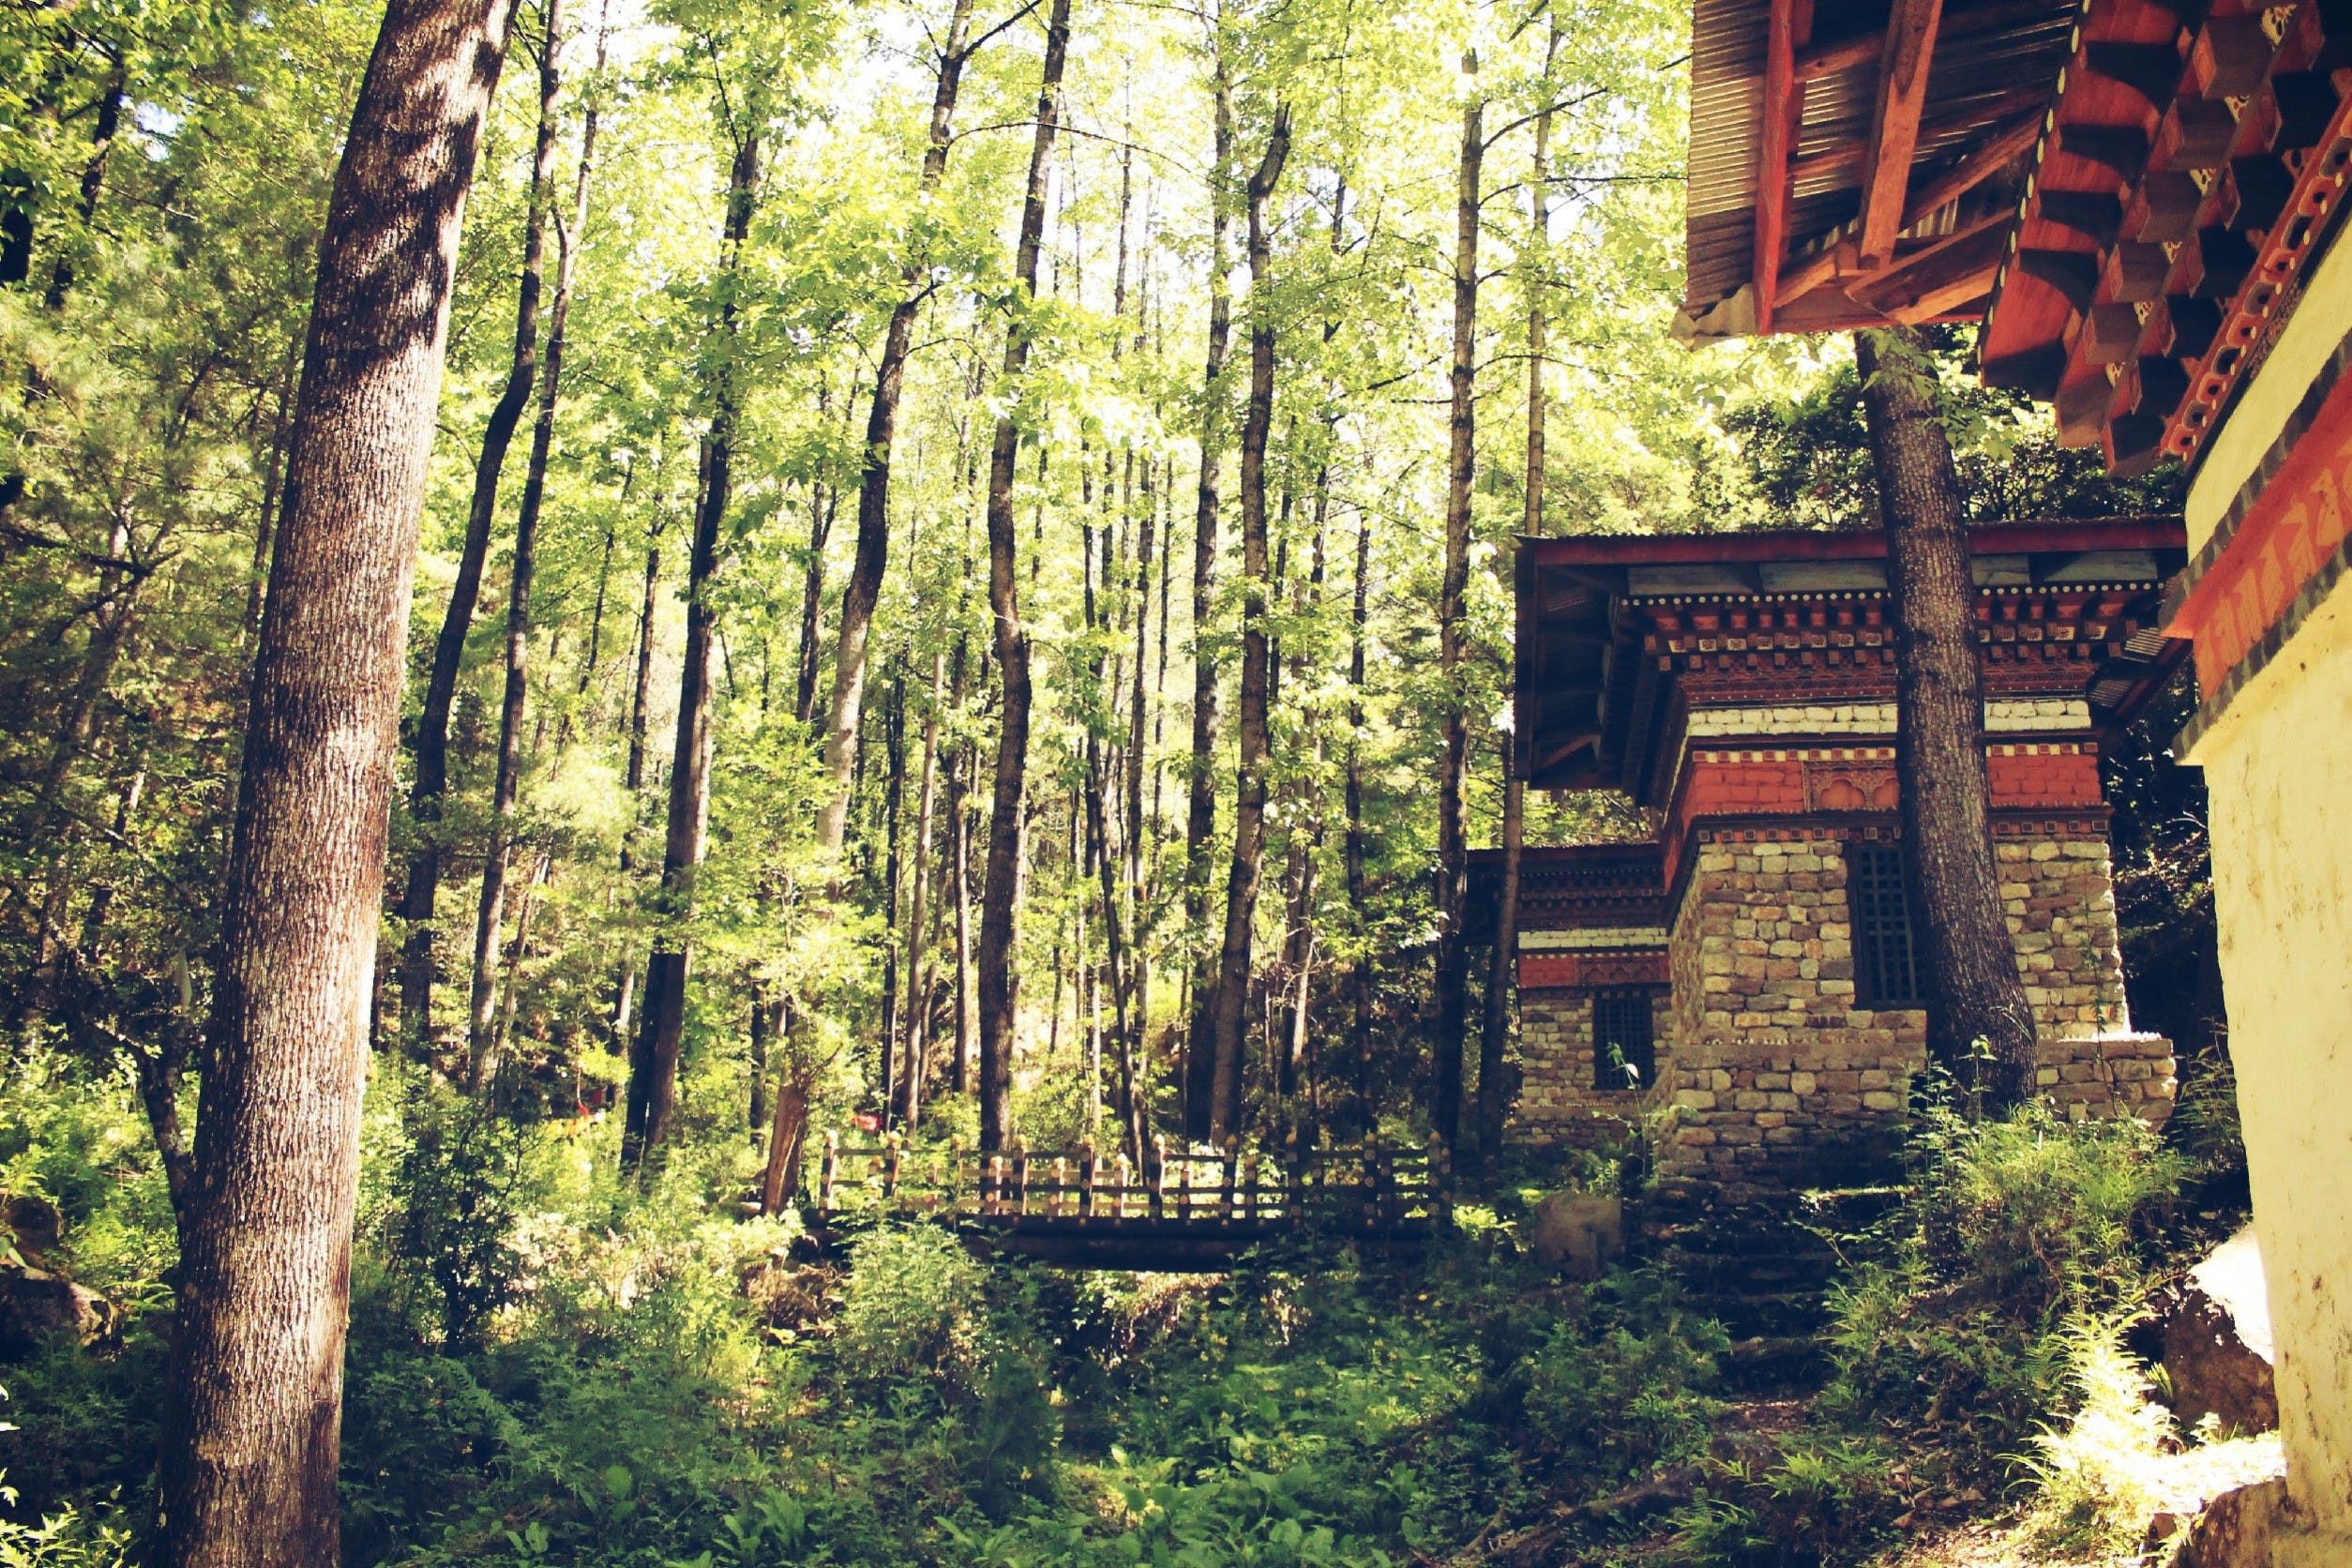 House Near Trees With Bridge Photo